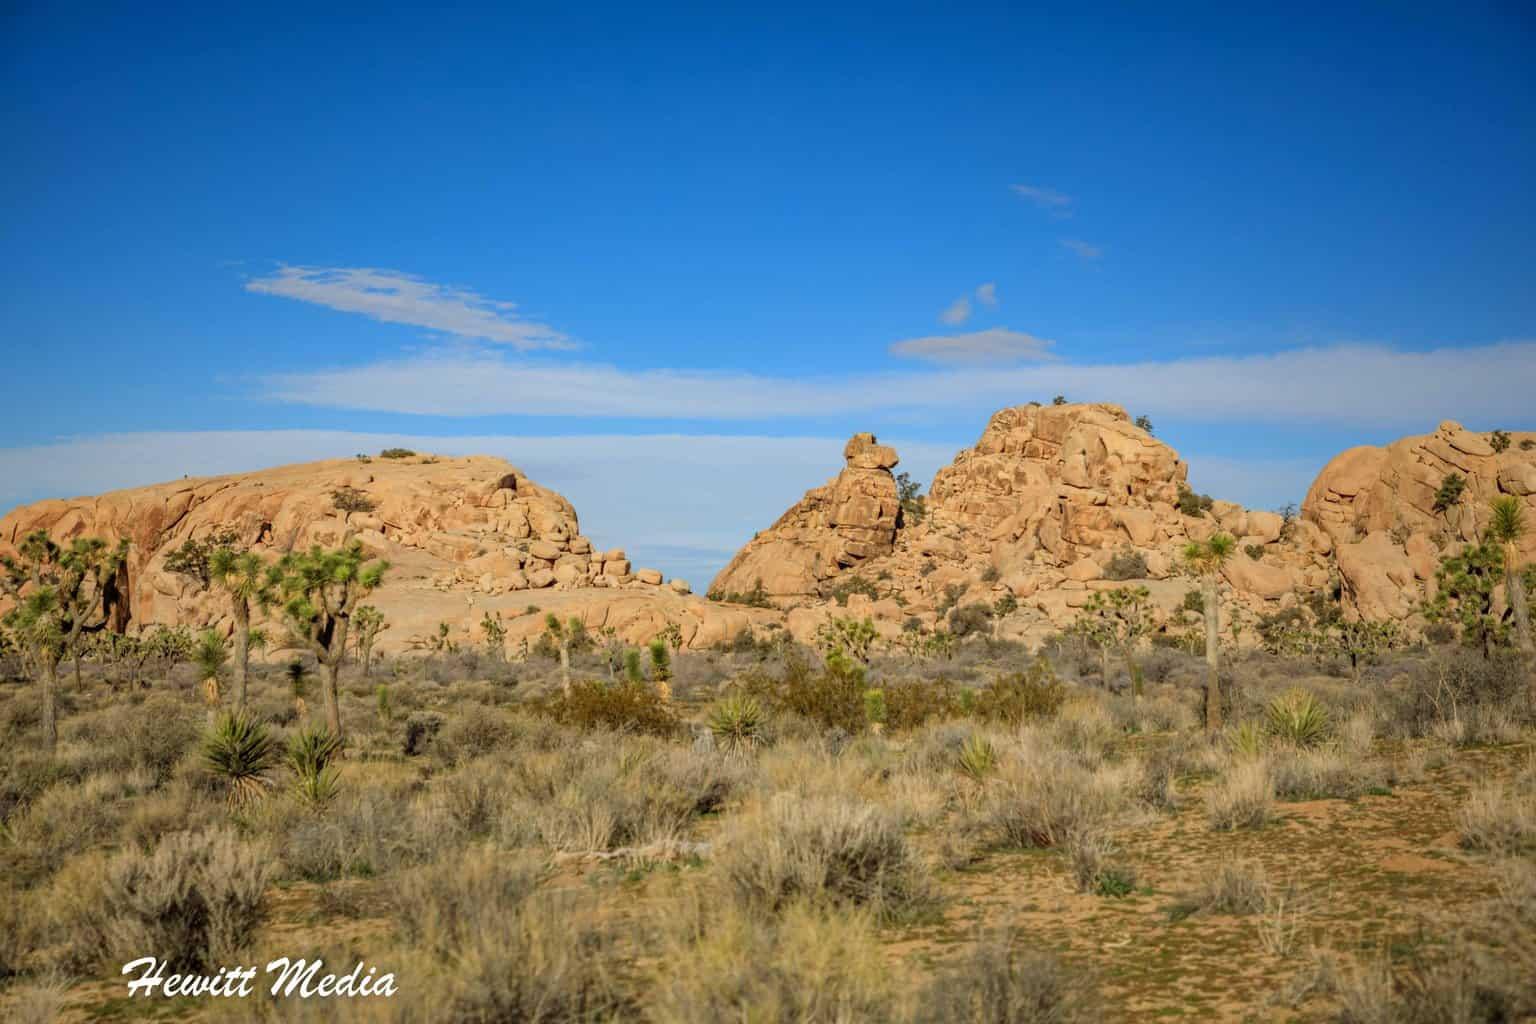 Rock formations inside Joshua Tree National Park